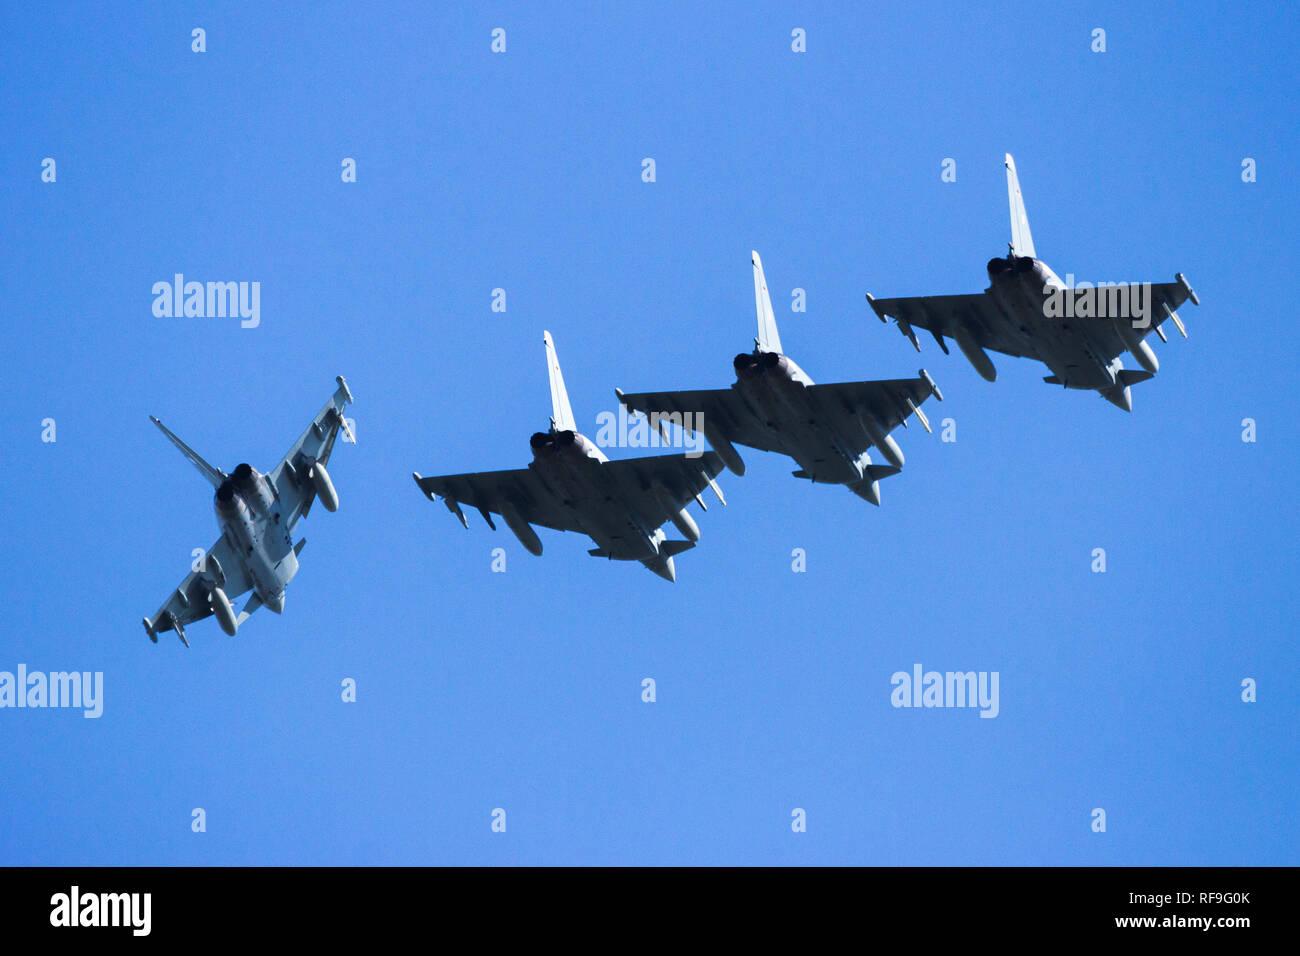 LEEUWARDEN, THE NETHERLANDS - APR 21, 2016: German Air Force